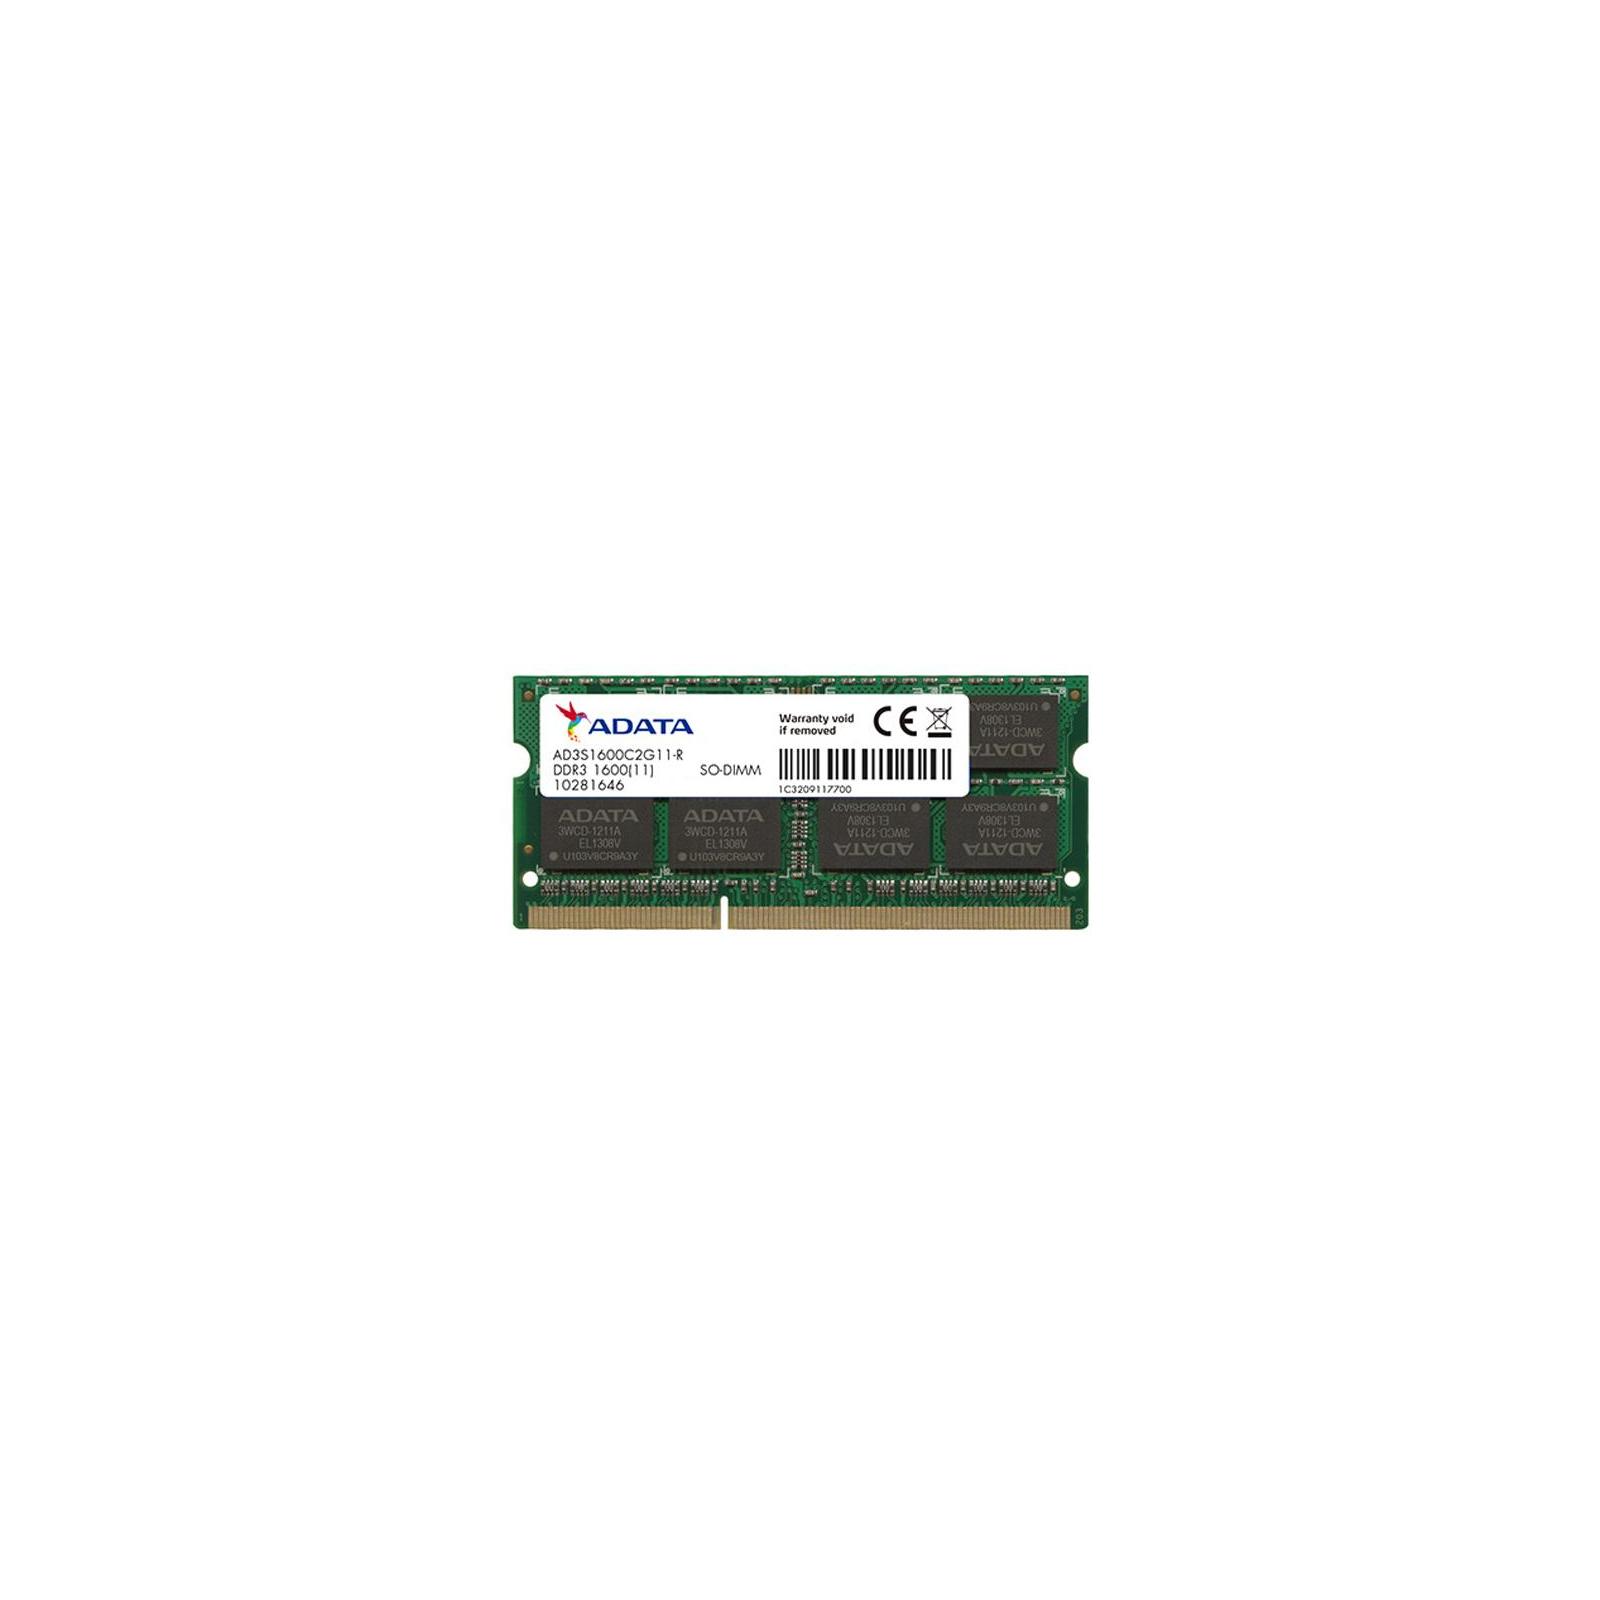 Модуль памяти для ноутбука SoDIMM DDR3 2GB 1600 MHz ADATA (AD3S160022G11-S)